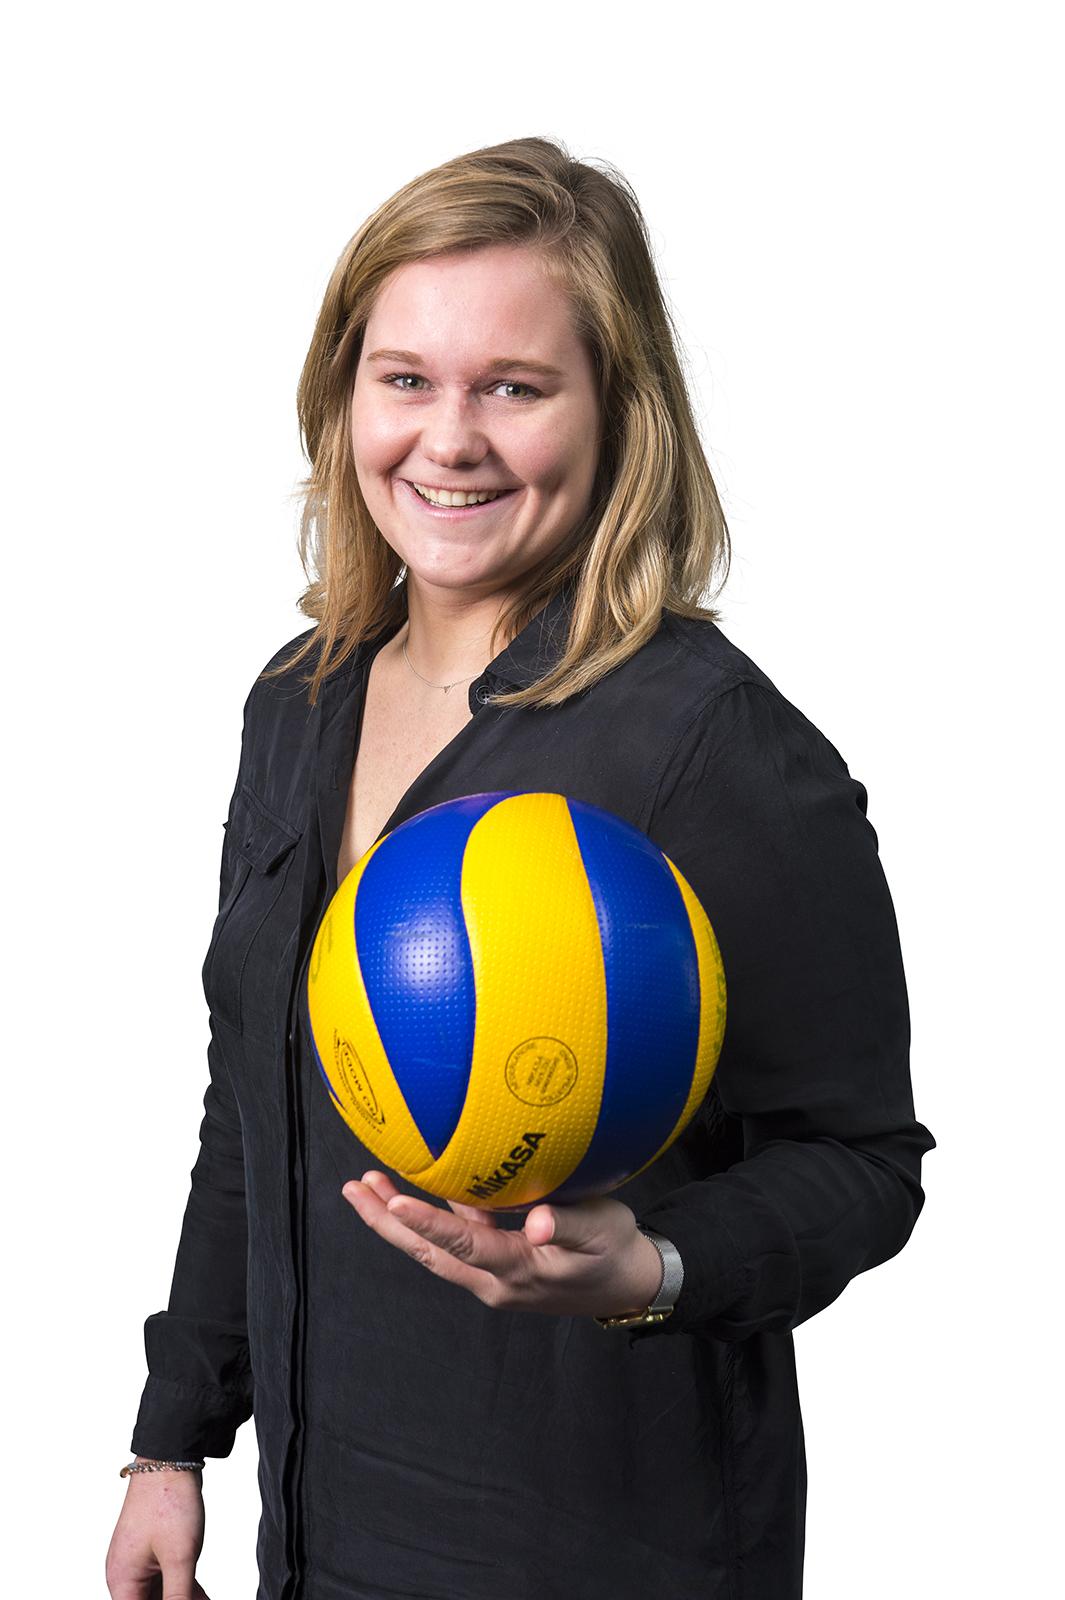 Wendy van den Brink